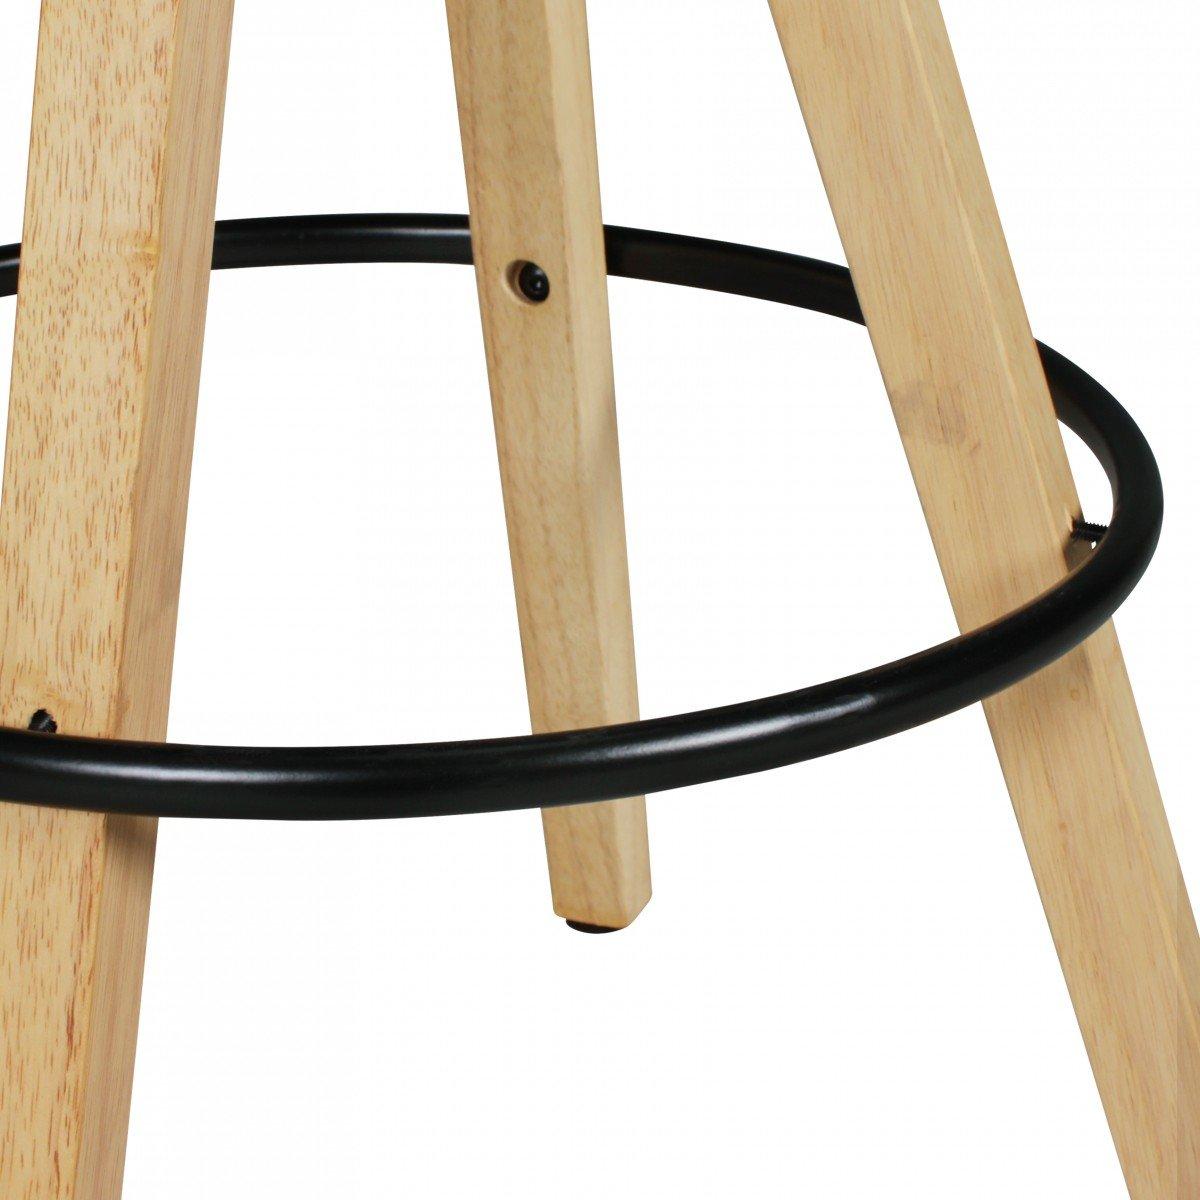 FineBuy 2er Set Barhocker Retro Design Kunst-Leder Holz Holz Holz mit Rücken-Lehne in schwarz   Design Barstuhl Retro Skandinavisch 2 Stück   Tresenhocker Sitzhöhe 72 cm 1e2dda